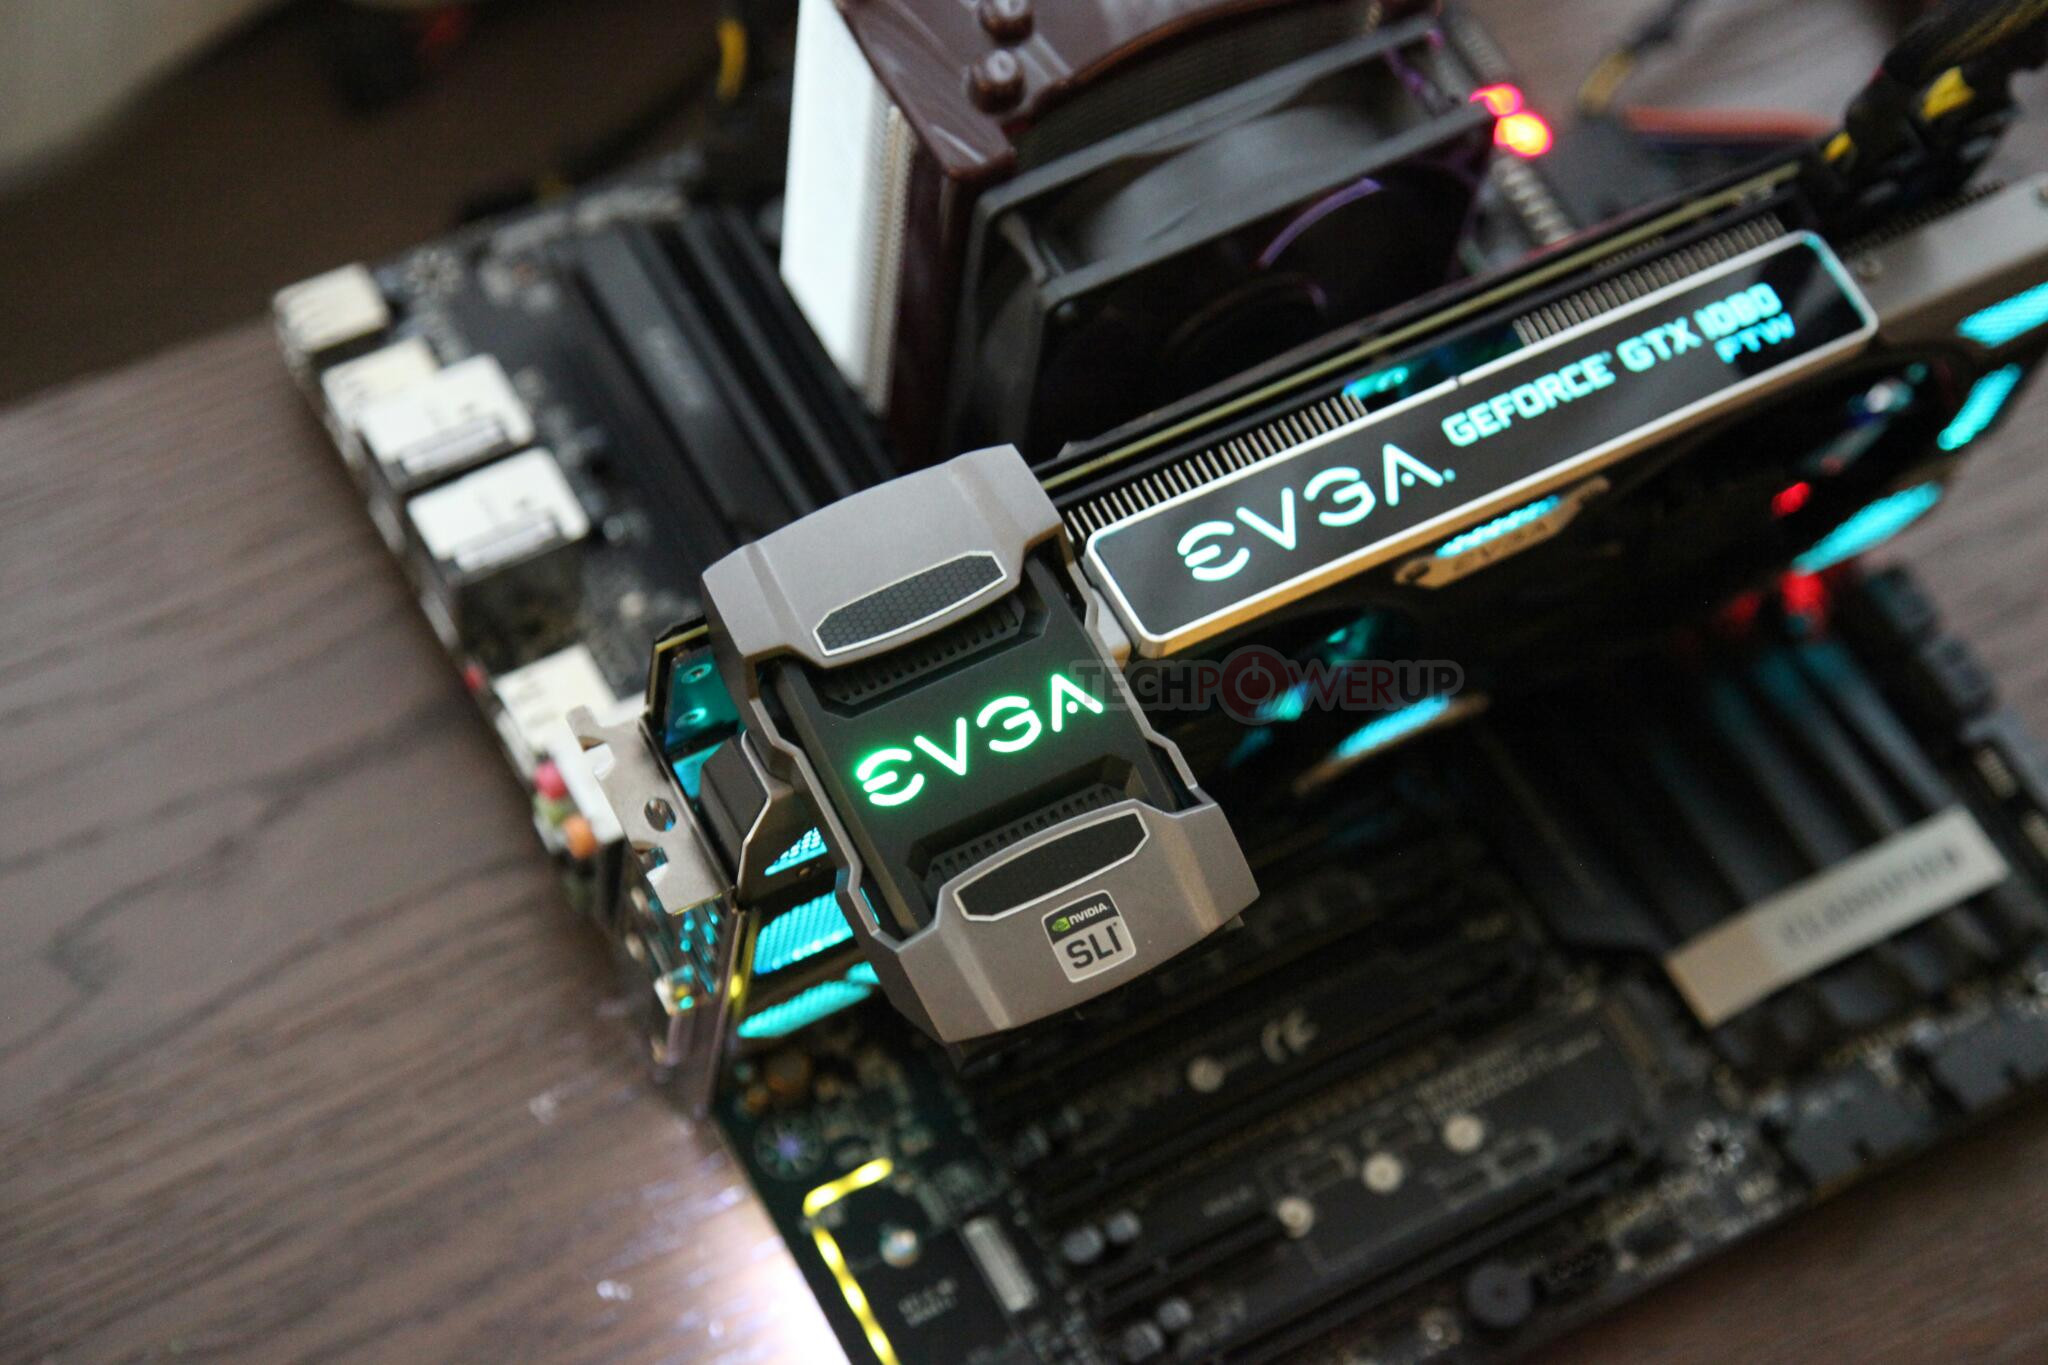 Nuevos puentes SLI de alto rendimiento EVGA SLI HB 2